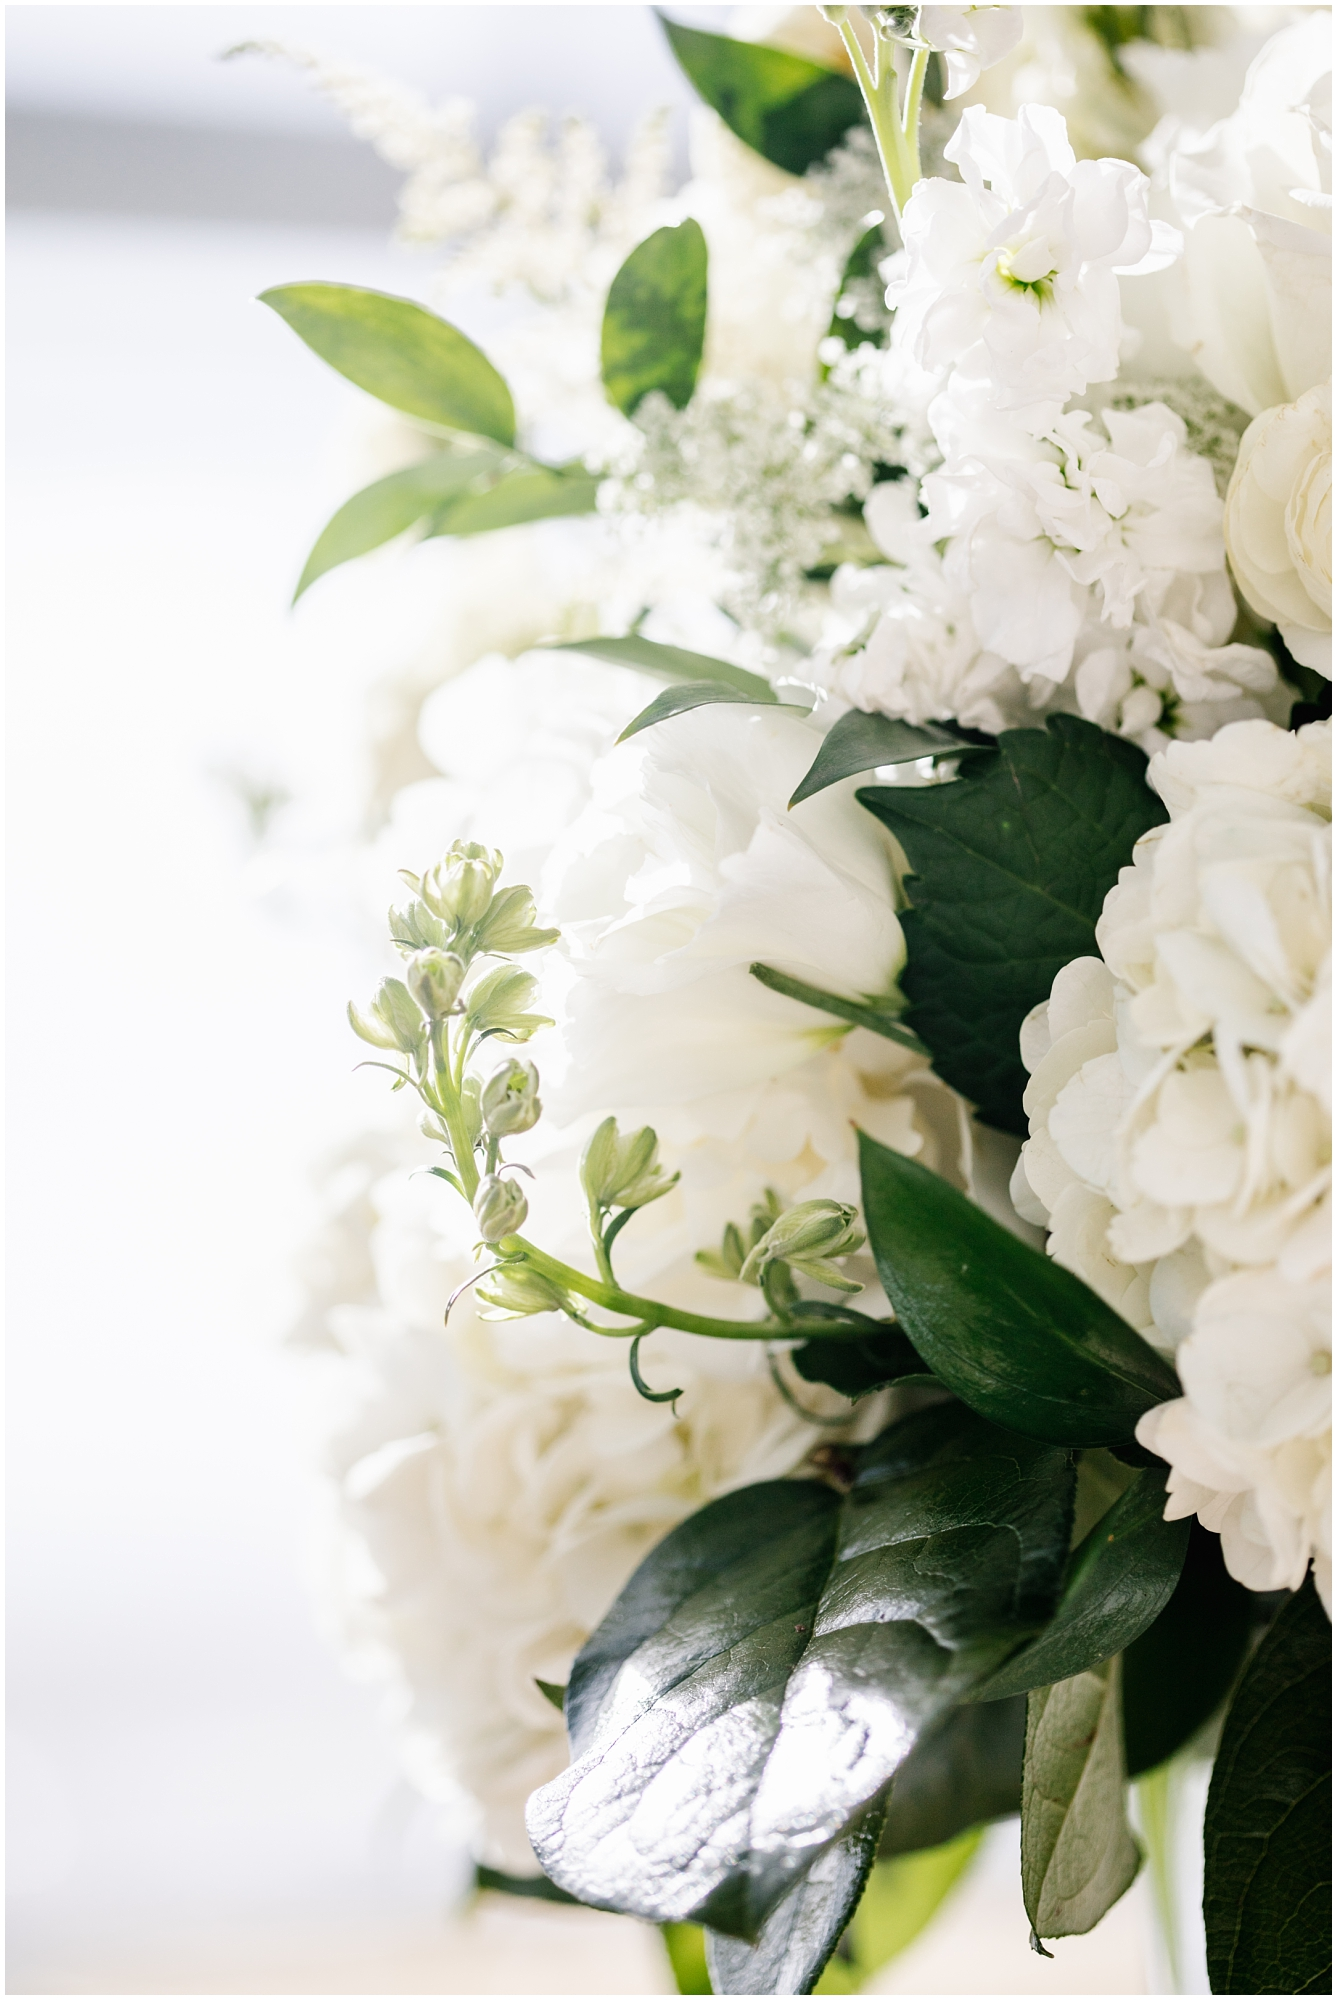 CherylandTyler-337_Lizzie-B-Imagery-Utah-Wedding-Photographer-Park-City-Salt-Lake-City-Temple-Wells-Fargo-Building.jpg